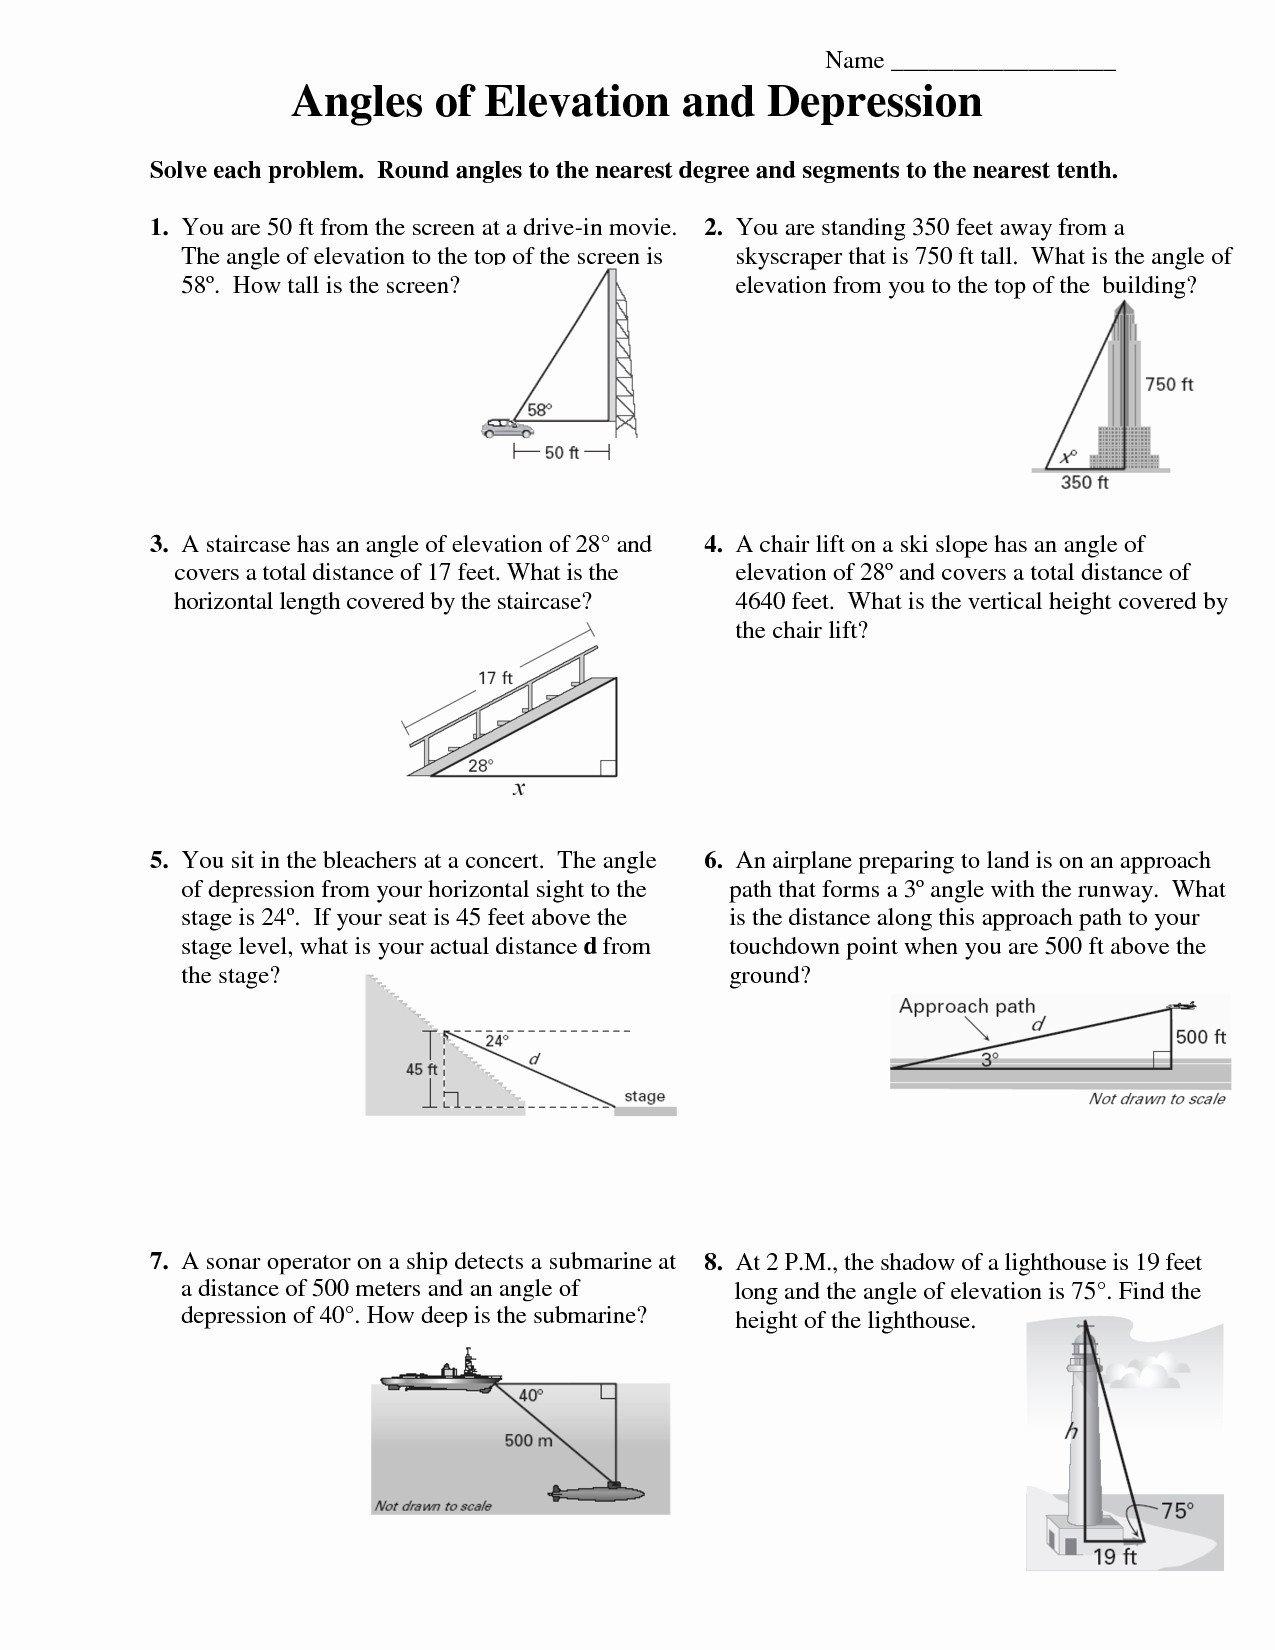 Angle Of Elevation And Depression Worksheet With Answers  Yooob Also Angle Of Elevation And Depression Worksheet With Answers